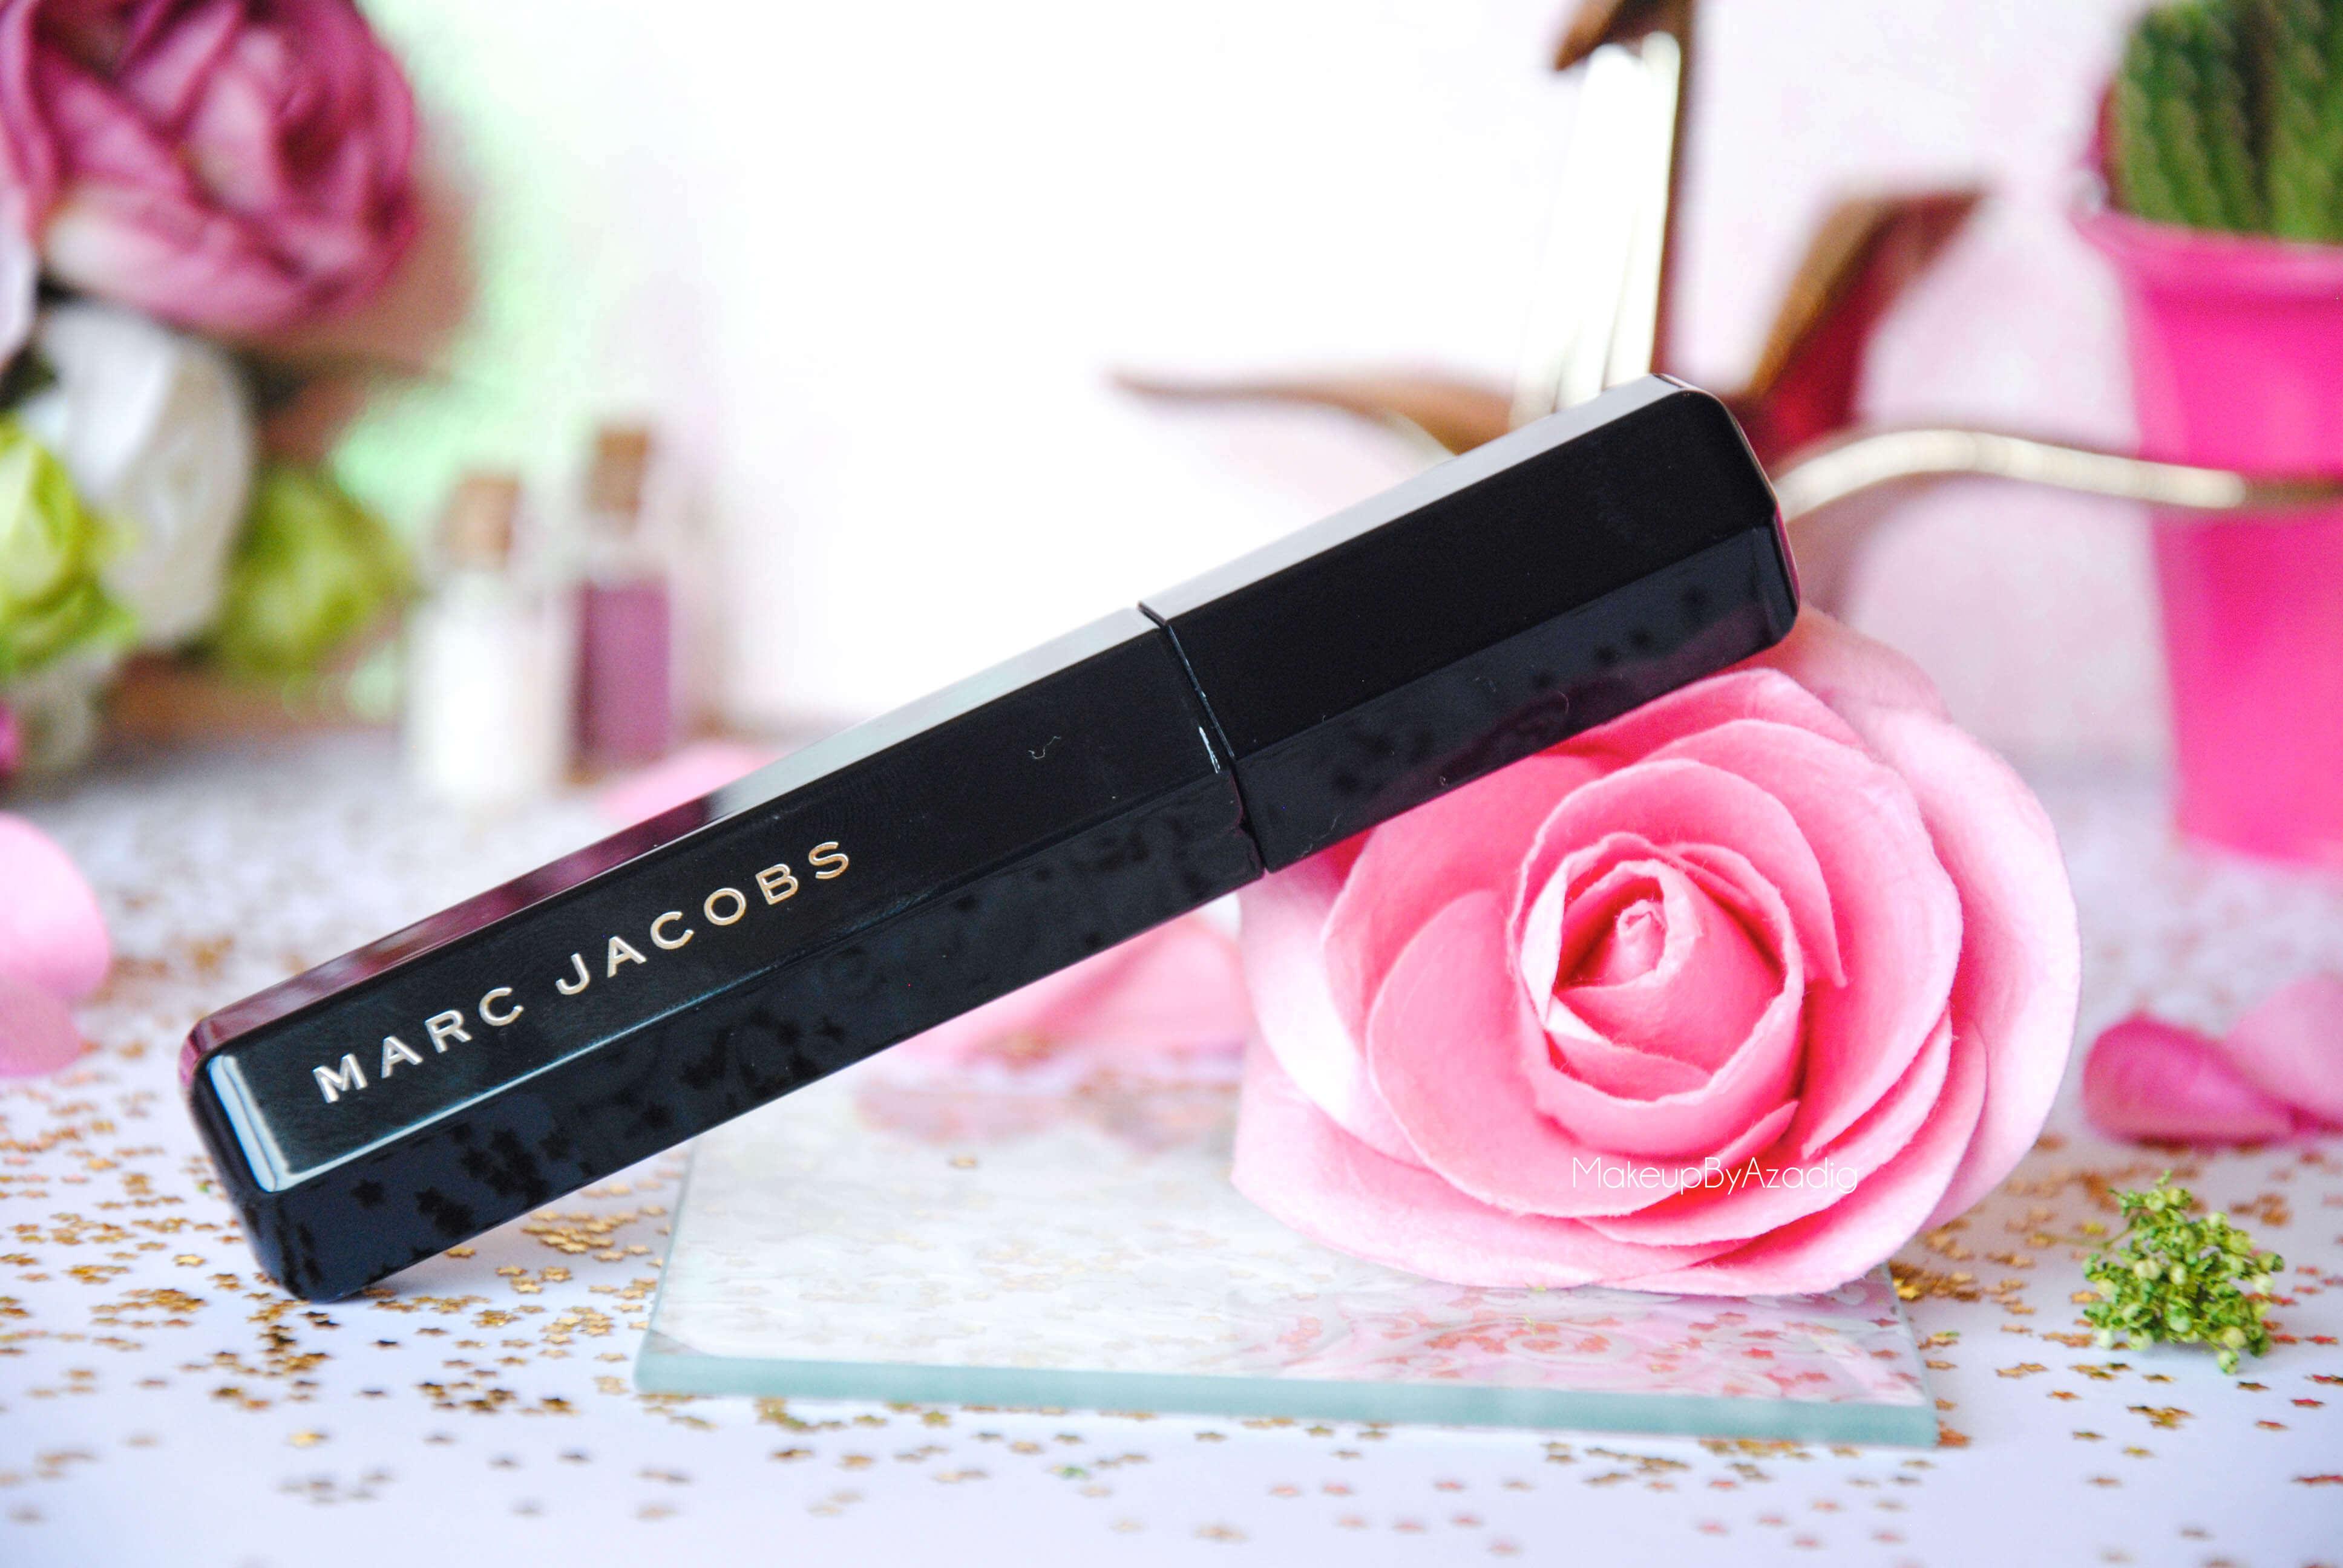 velvet noir-volume spectaculaire-marc jacobs-makeupbyazadig-revue-review-mascara-noir intense-rose